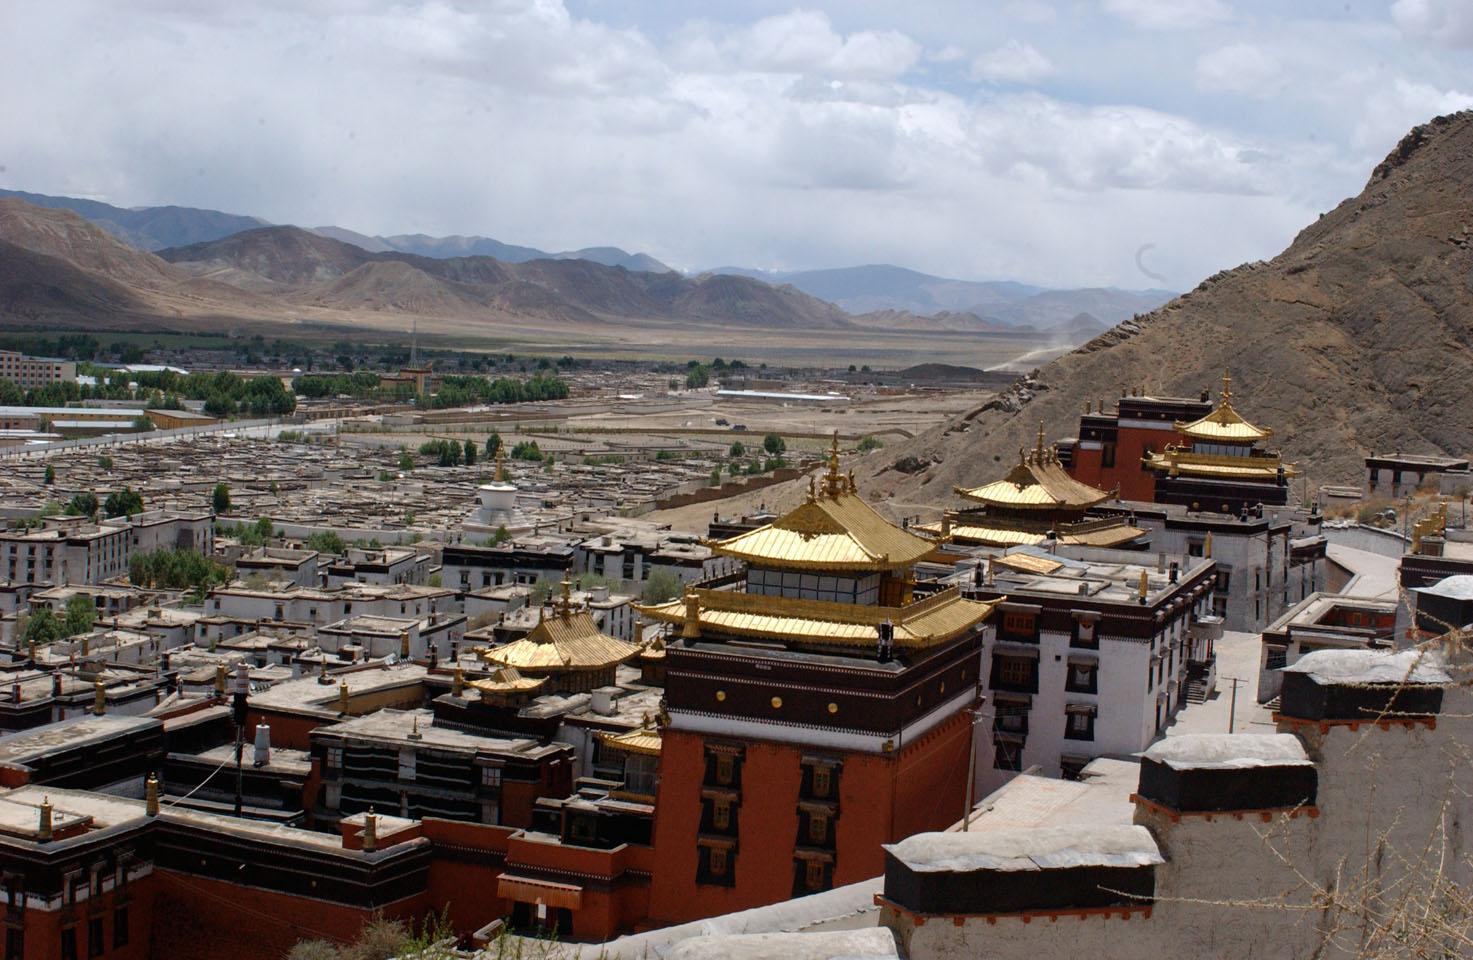 Tashi Lhunpo monastery, Tibet, from the outer circumambulation path. (Photo Bob Cayton)